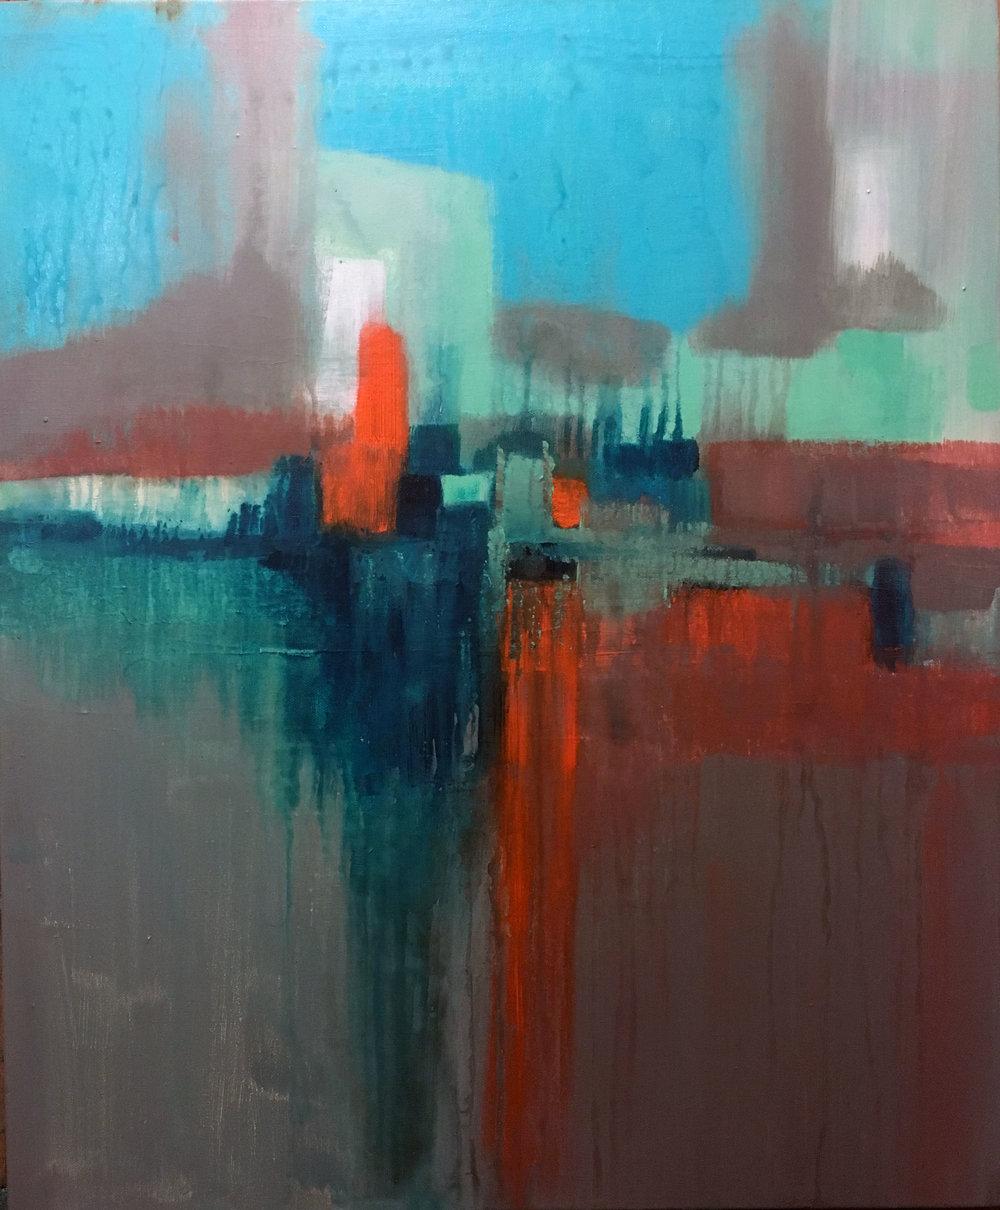 Parallel - 18 x 24 Acrylic, Mixed Media on canvas